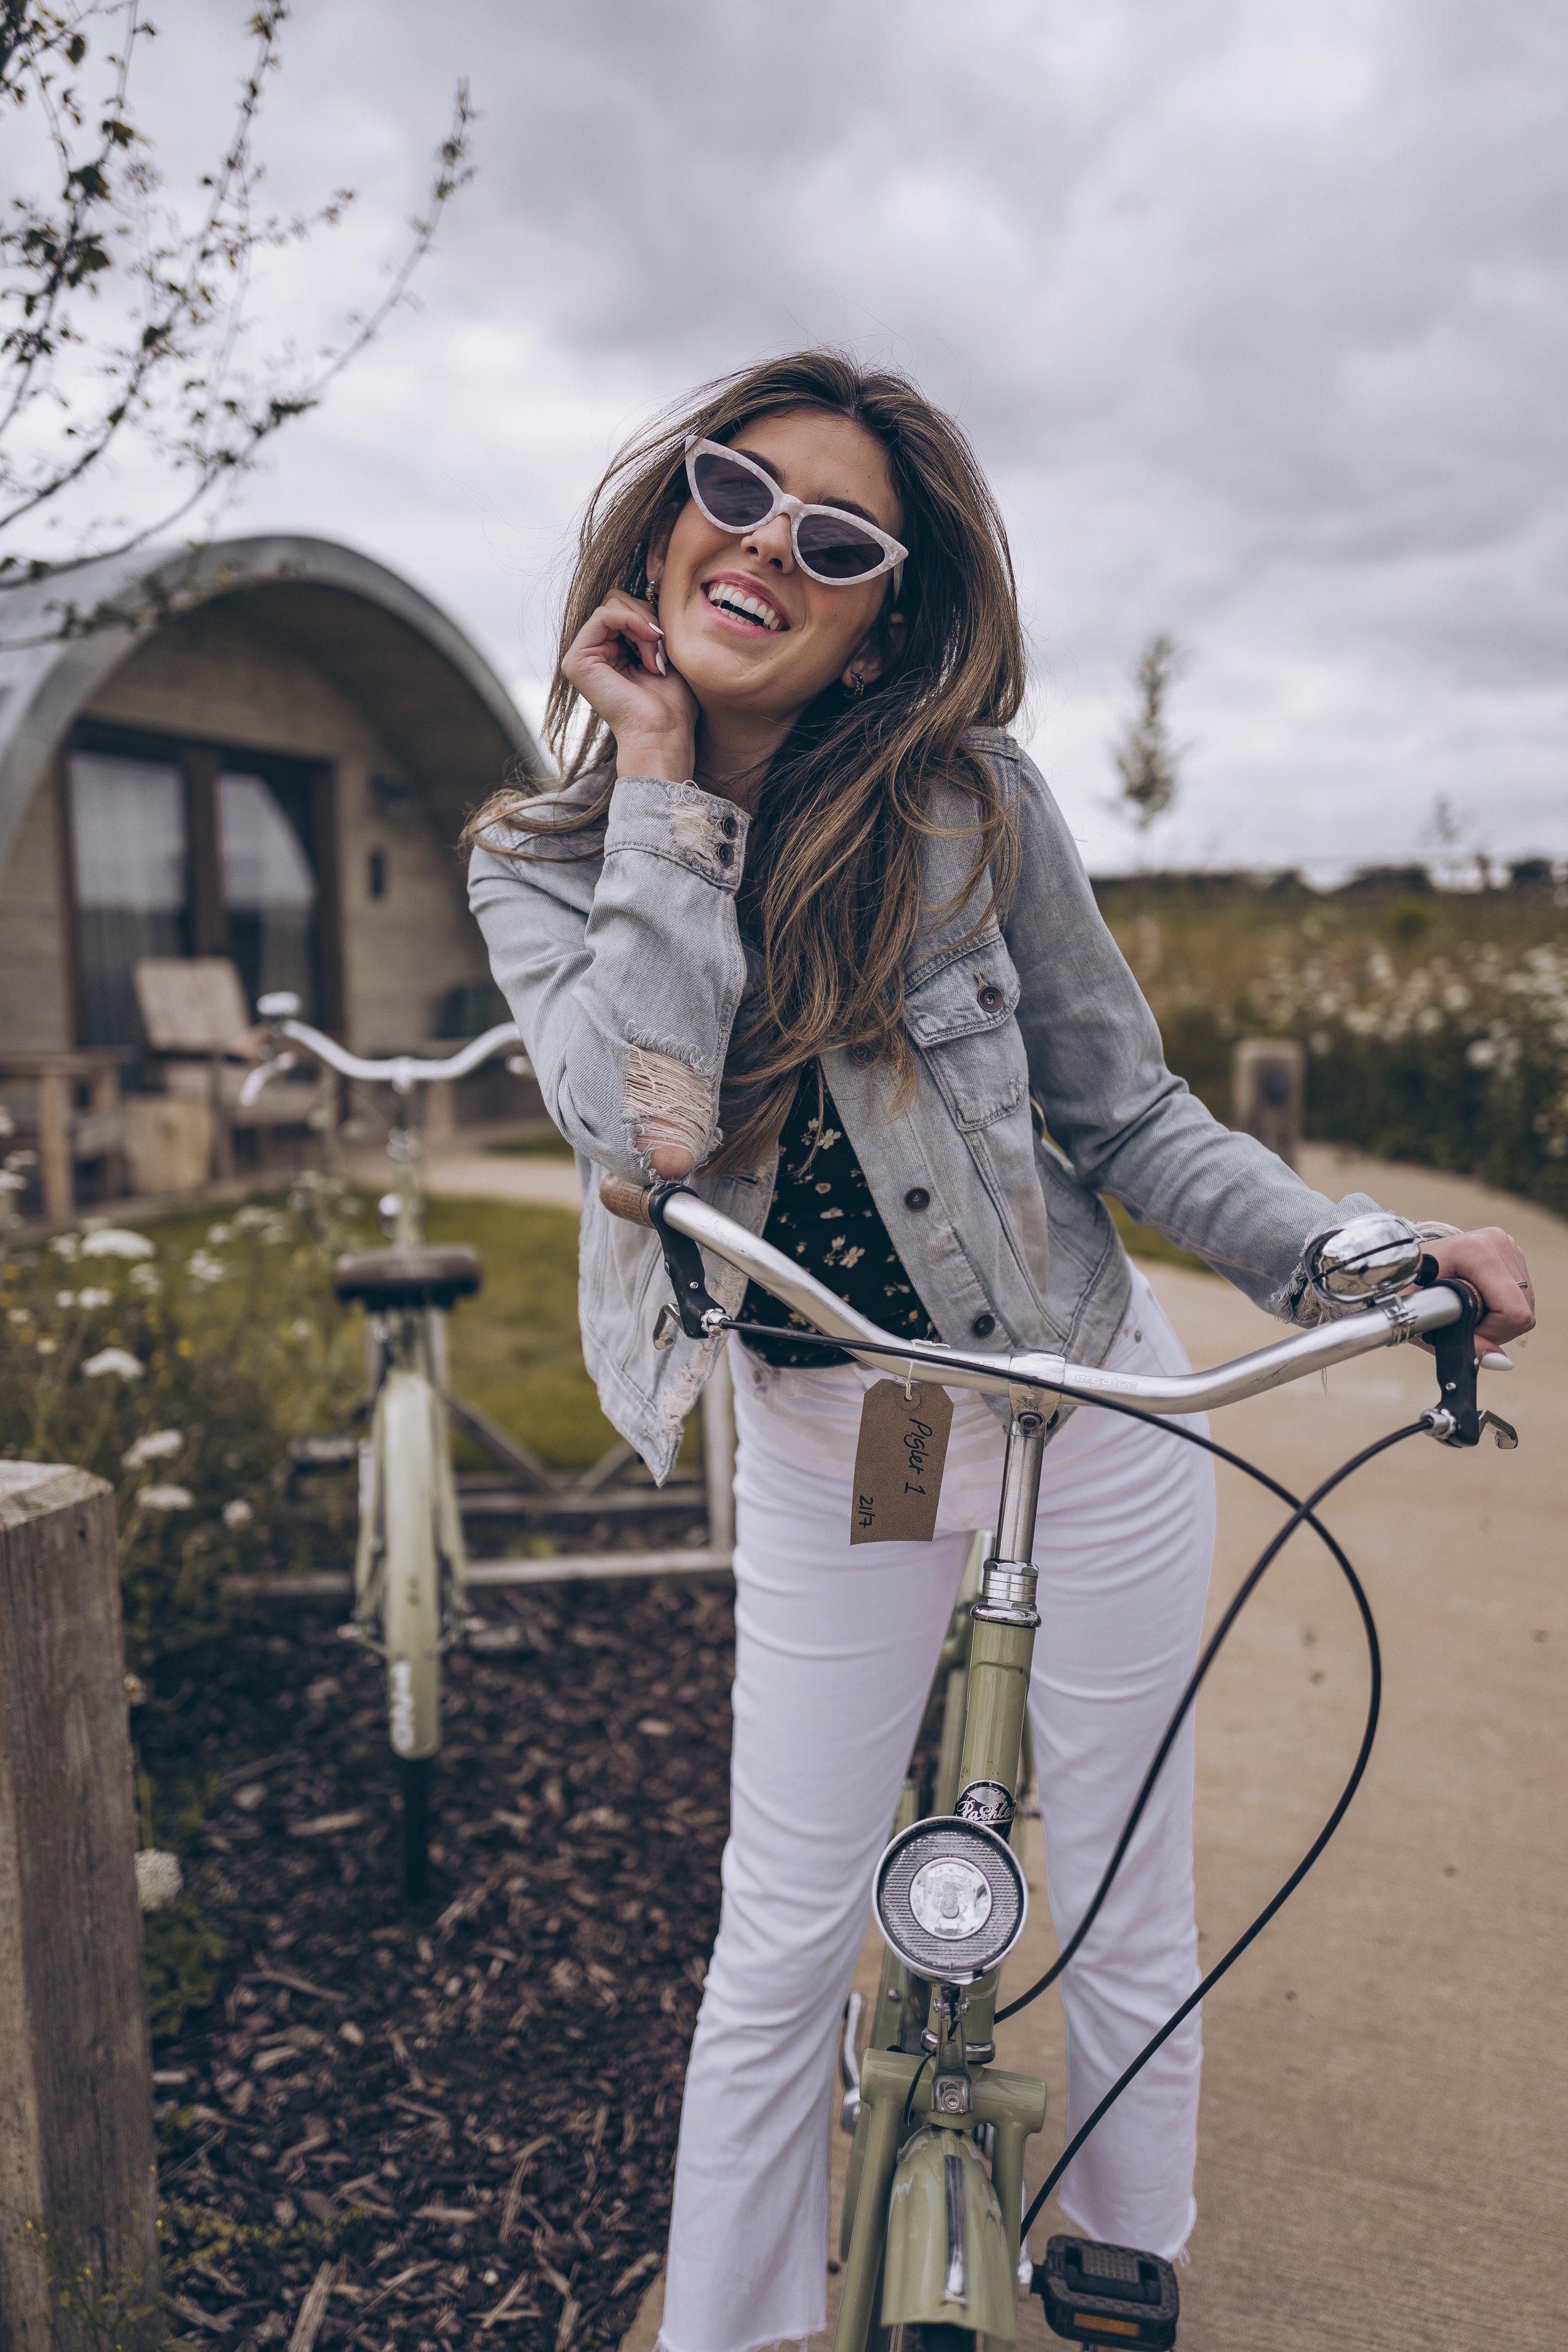 Julia friedman soho farmhouse bike riding